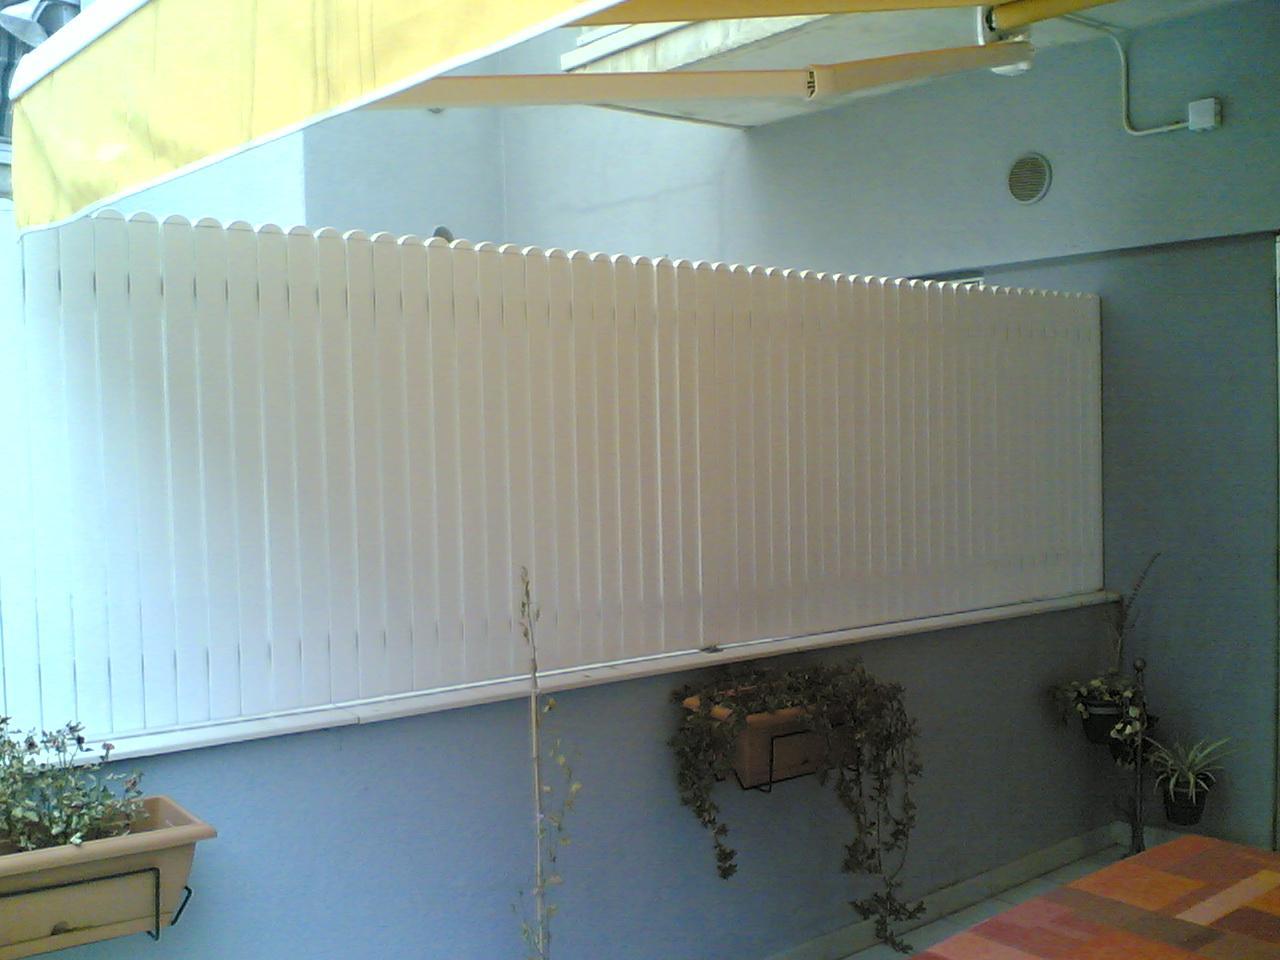 De aluminio para porches como uno de los aspectos a la - Estructuras de aluminio para terrazas ...